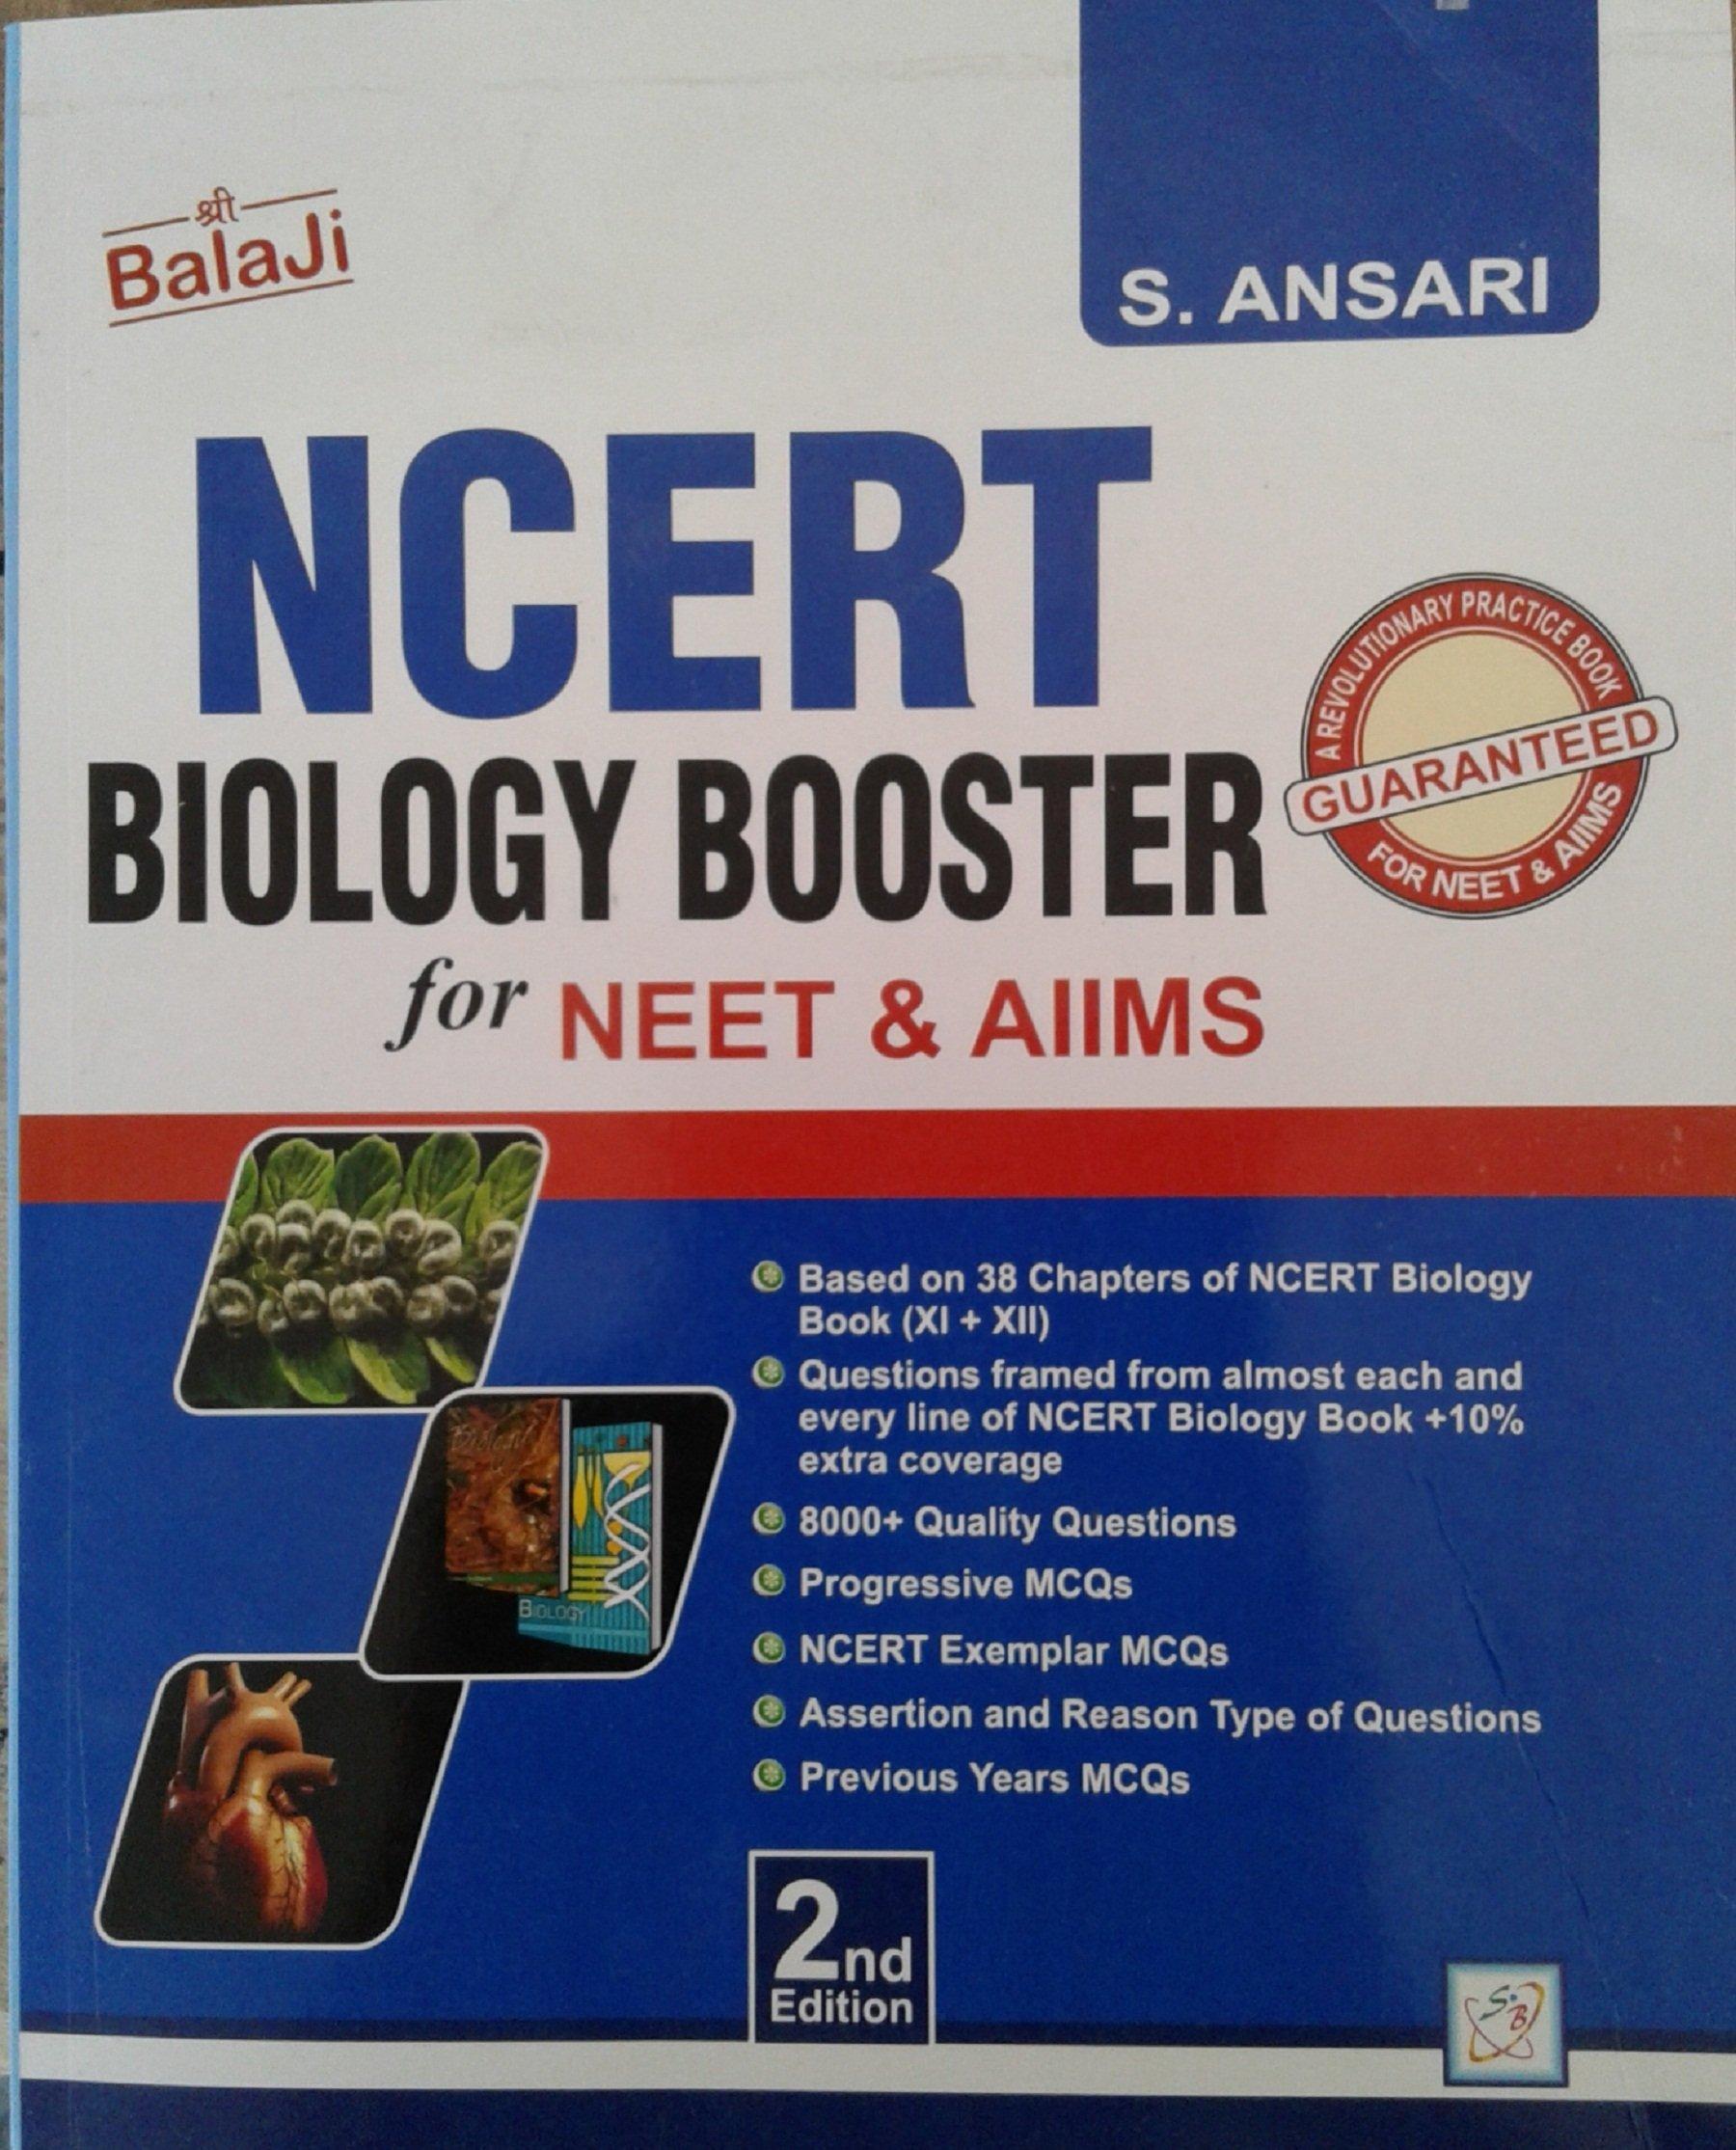 Buy Balaji NCERT Biology Booster Book Online at Low Prices